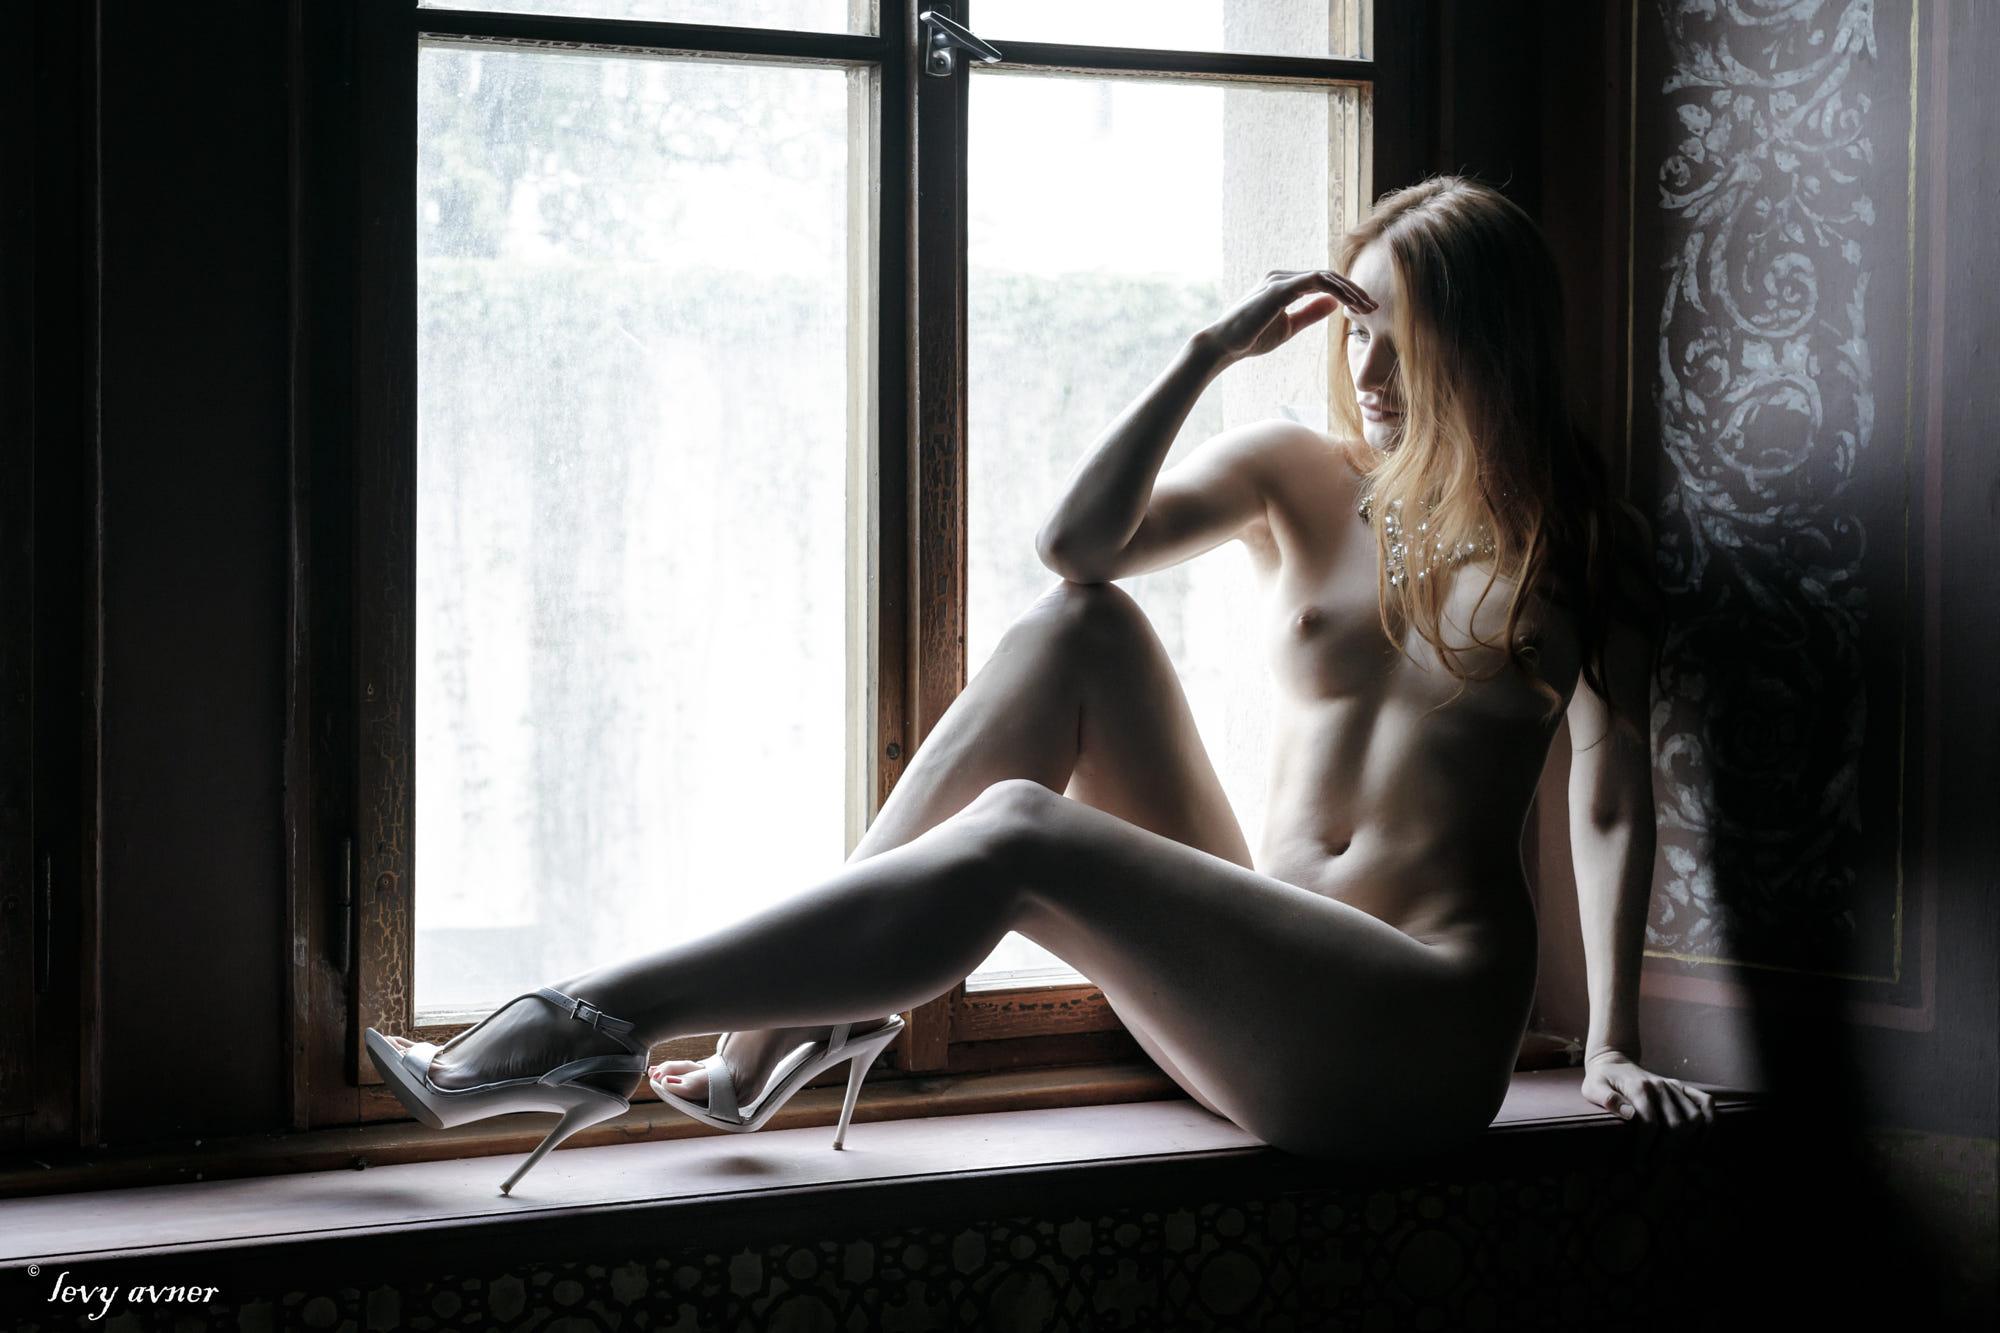 Levi johnston gets naked for america